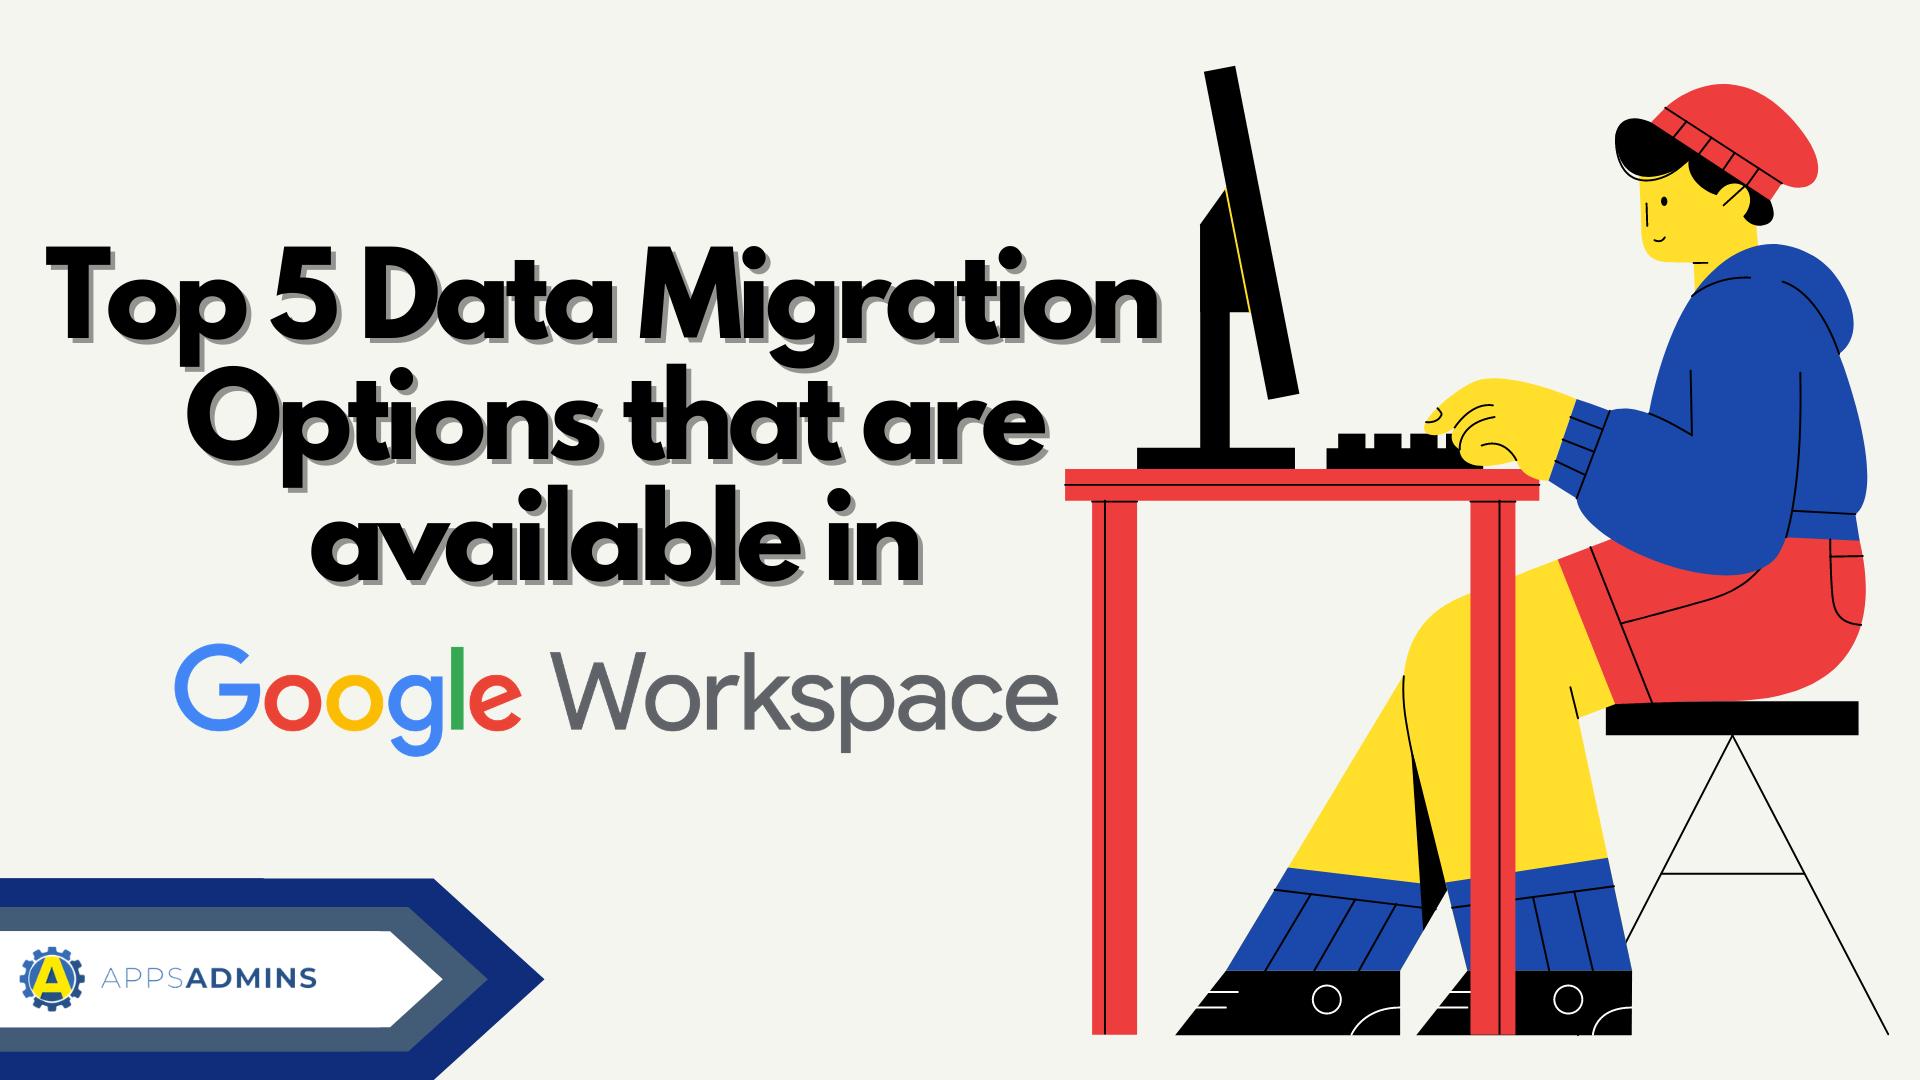 Data migration options